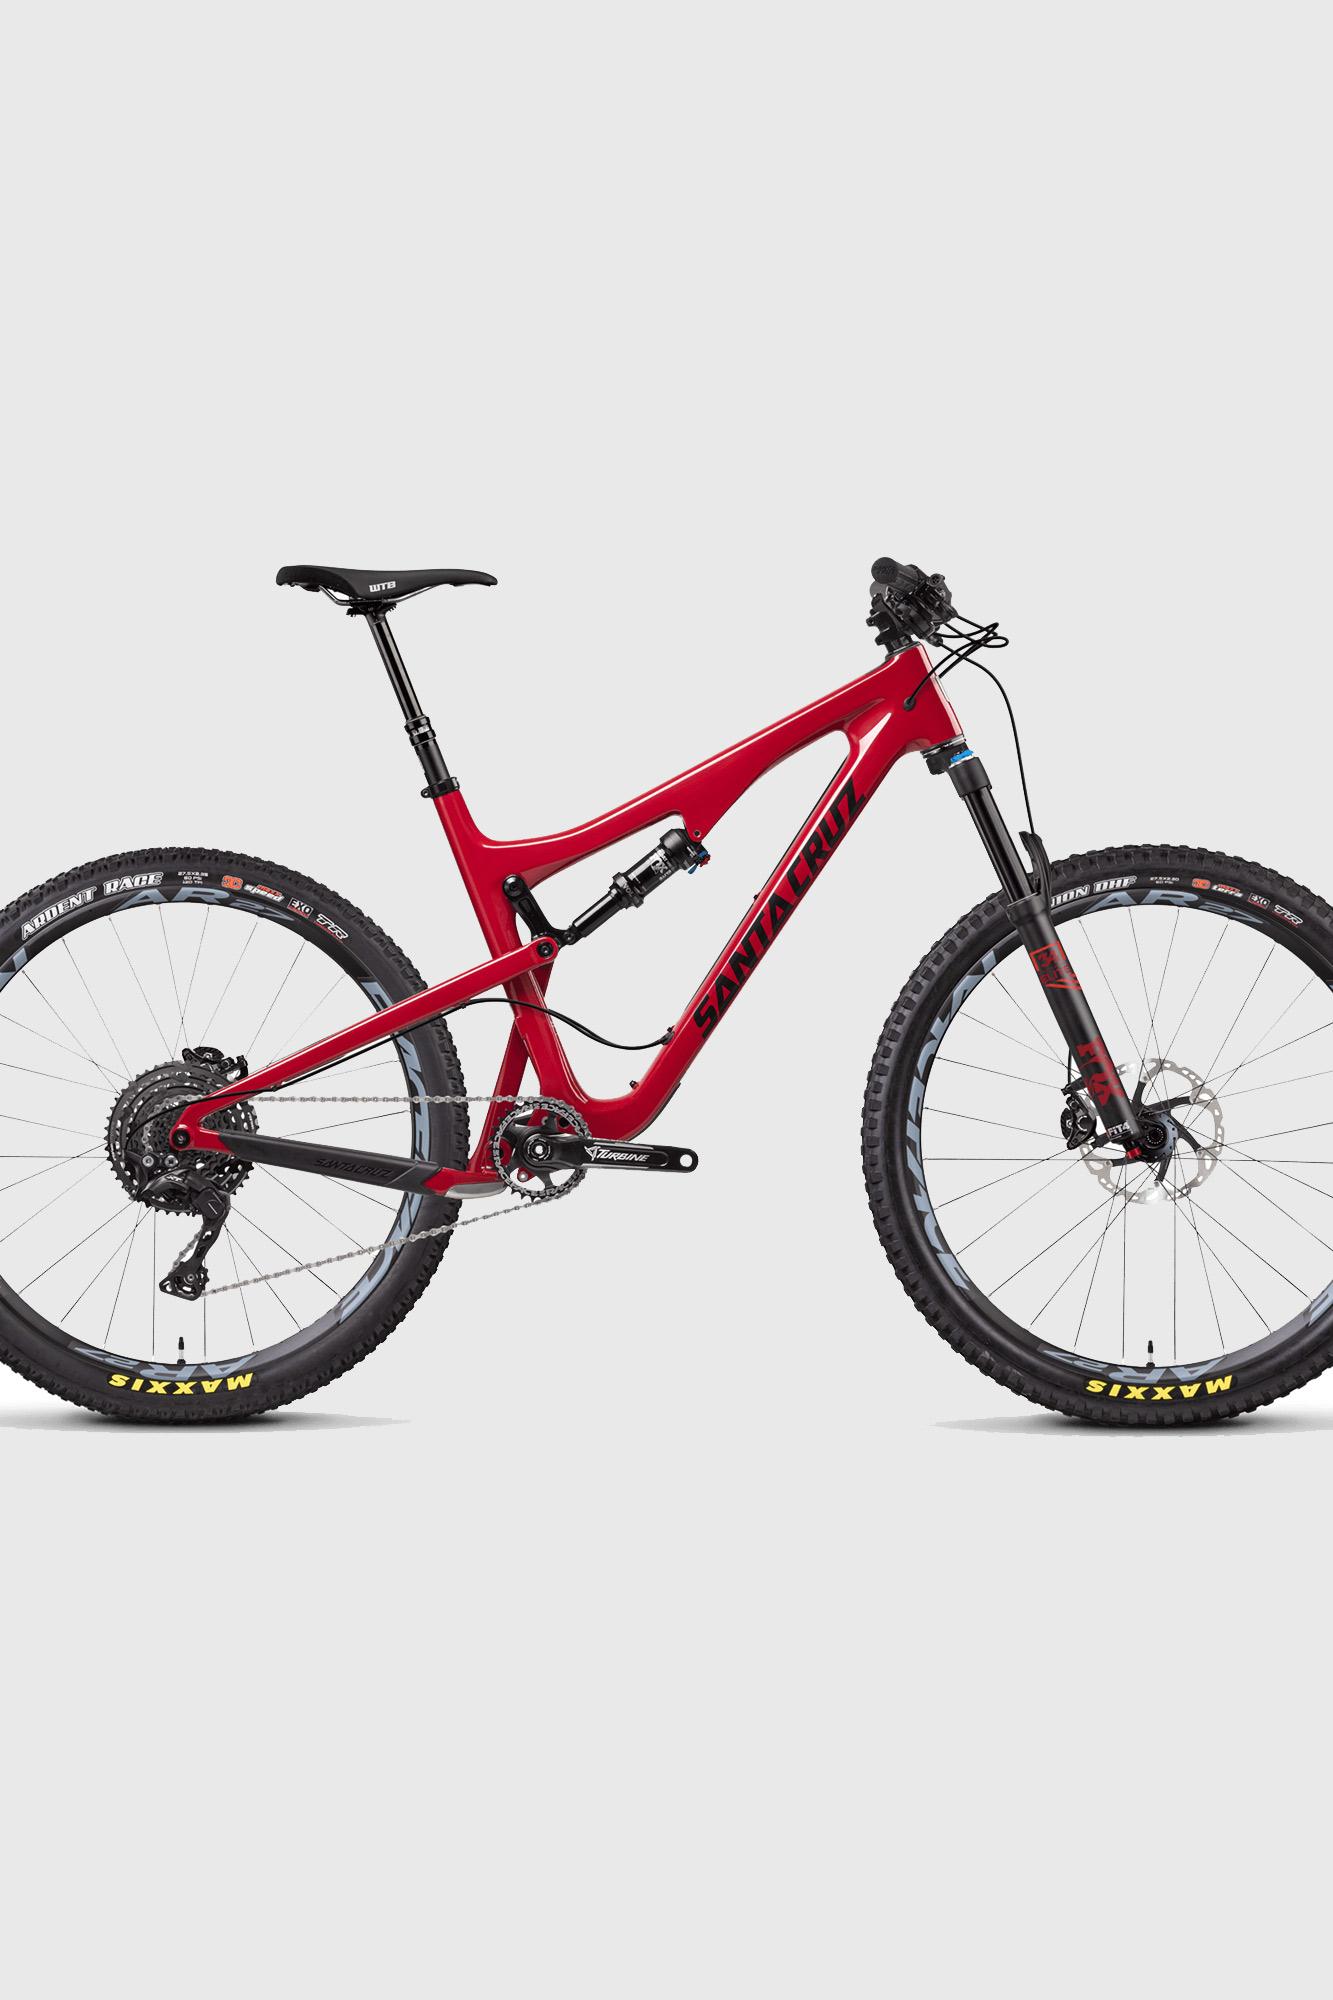 SANTA CRUZ 5010 mk2 CARBON C XE BUILD 27.5 TRAIL BIKE  [M or L] (Red or Dark blue) 1/2 price £2749.50 @ Stif cycles